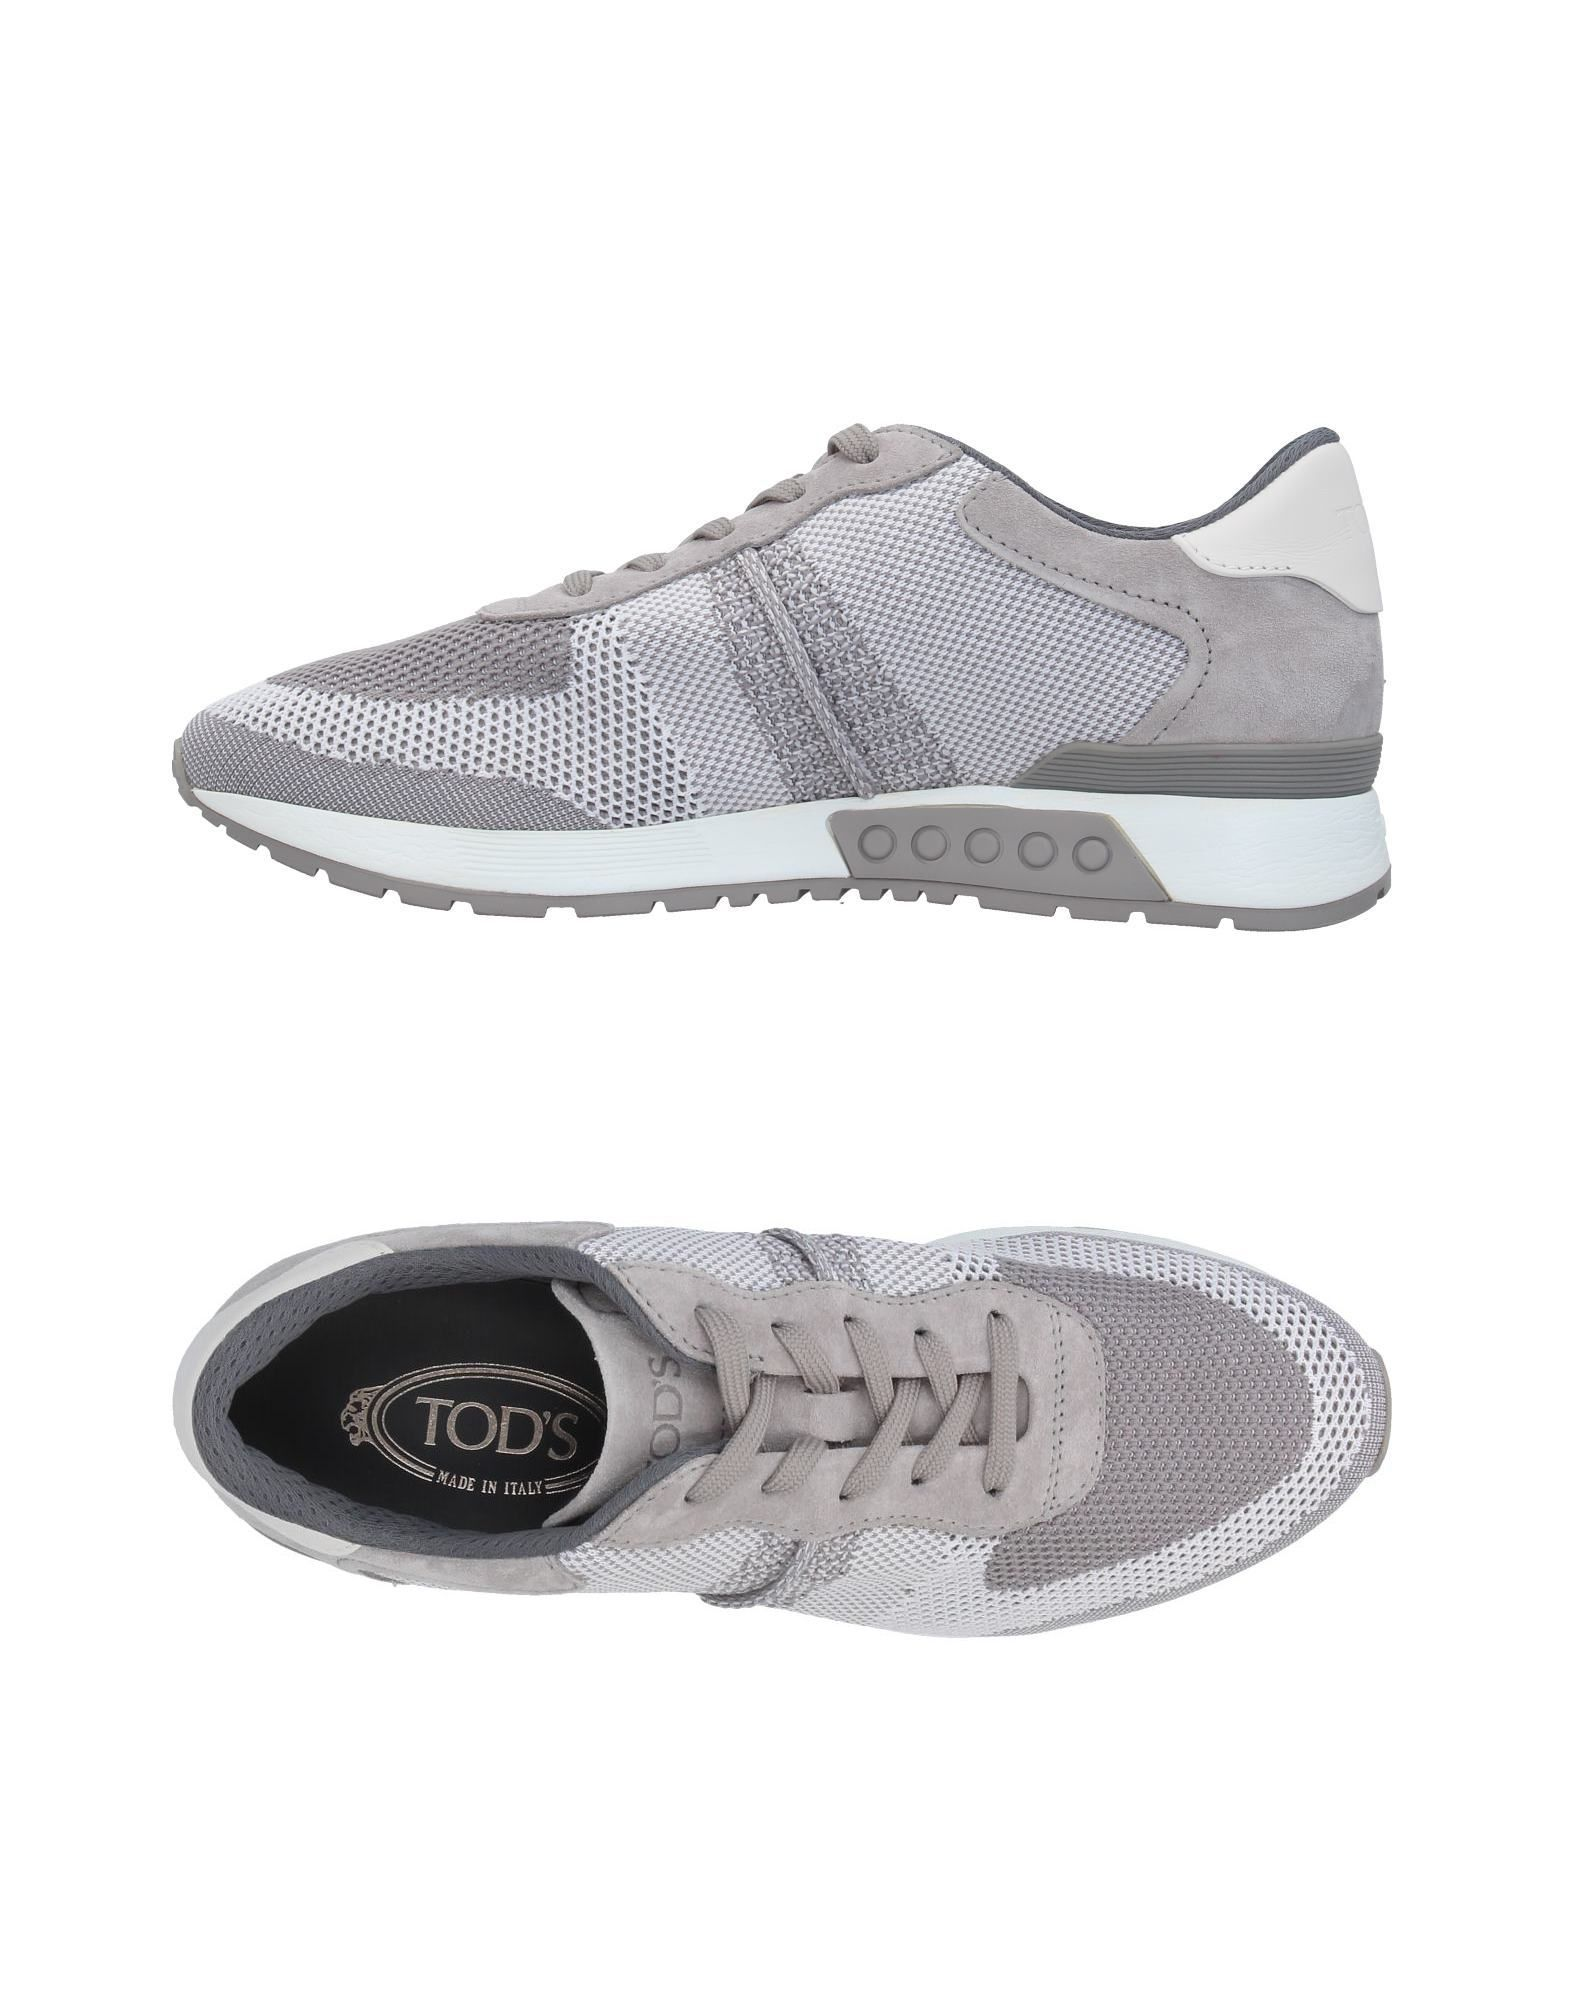 Moda Sneakers Tod's Uomo - - Uomo 11397518TL 9405ca